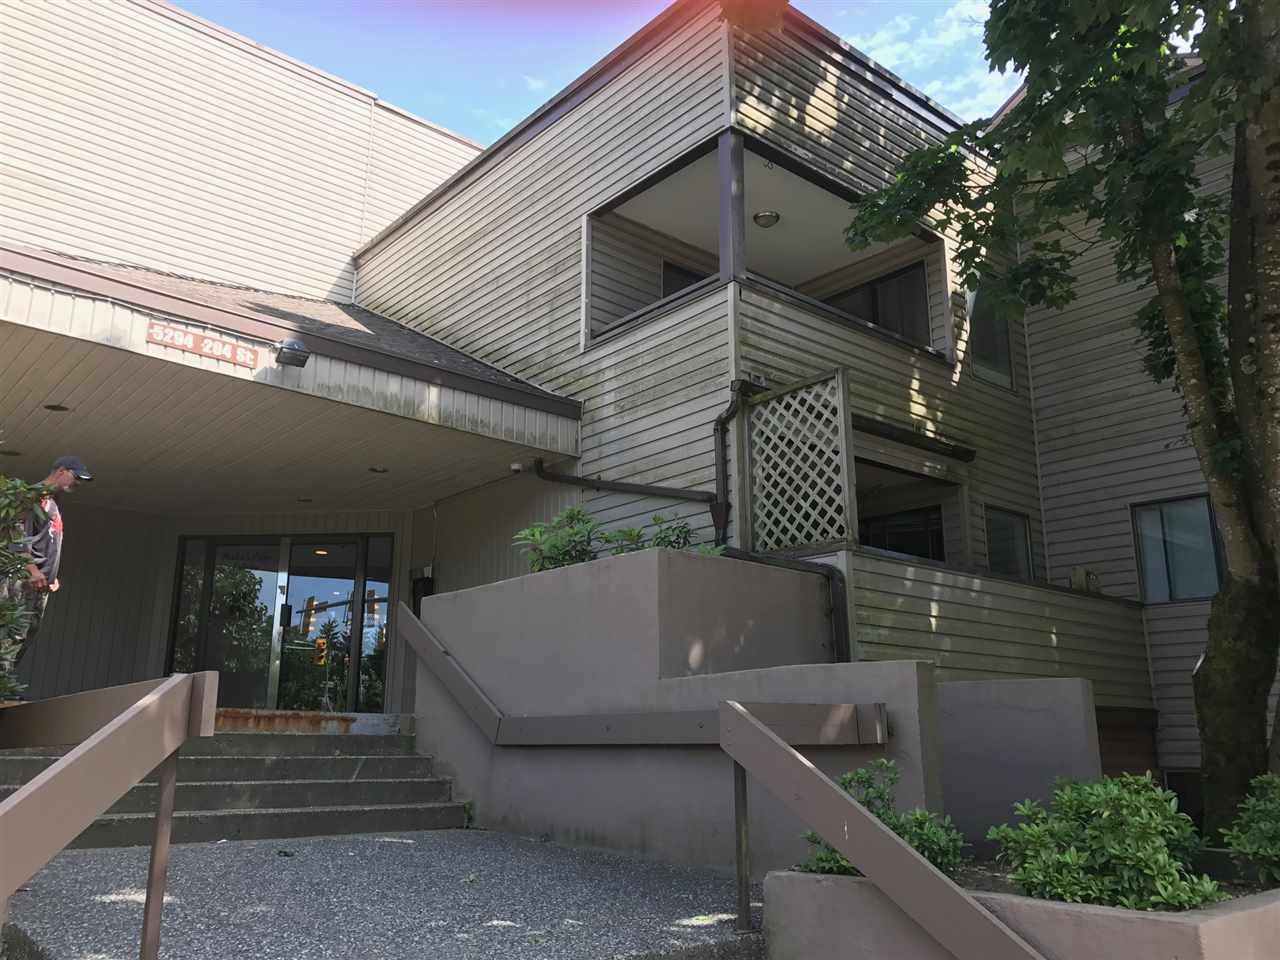 Condo Apartment at 305 5294 204 STREET, Unit 305, Langley, British Columbia. Image 1